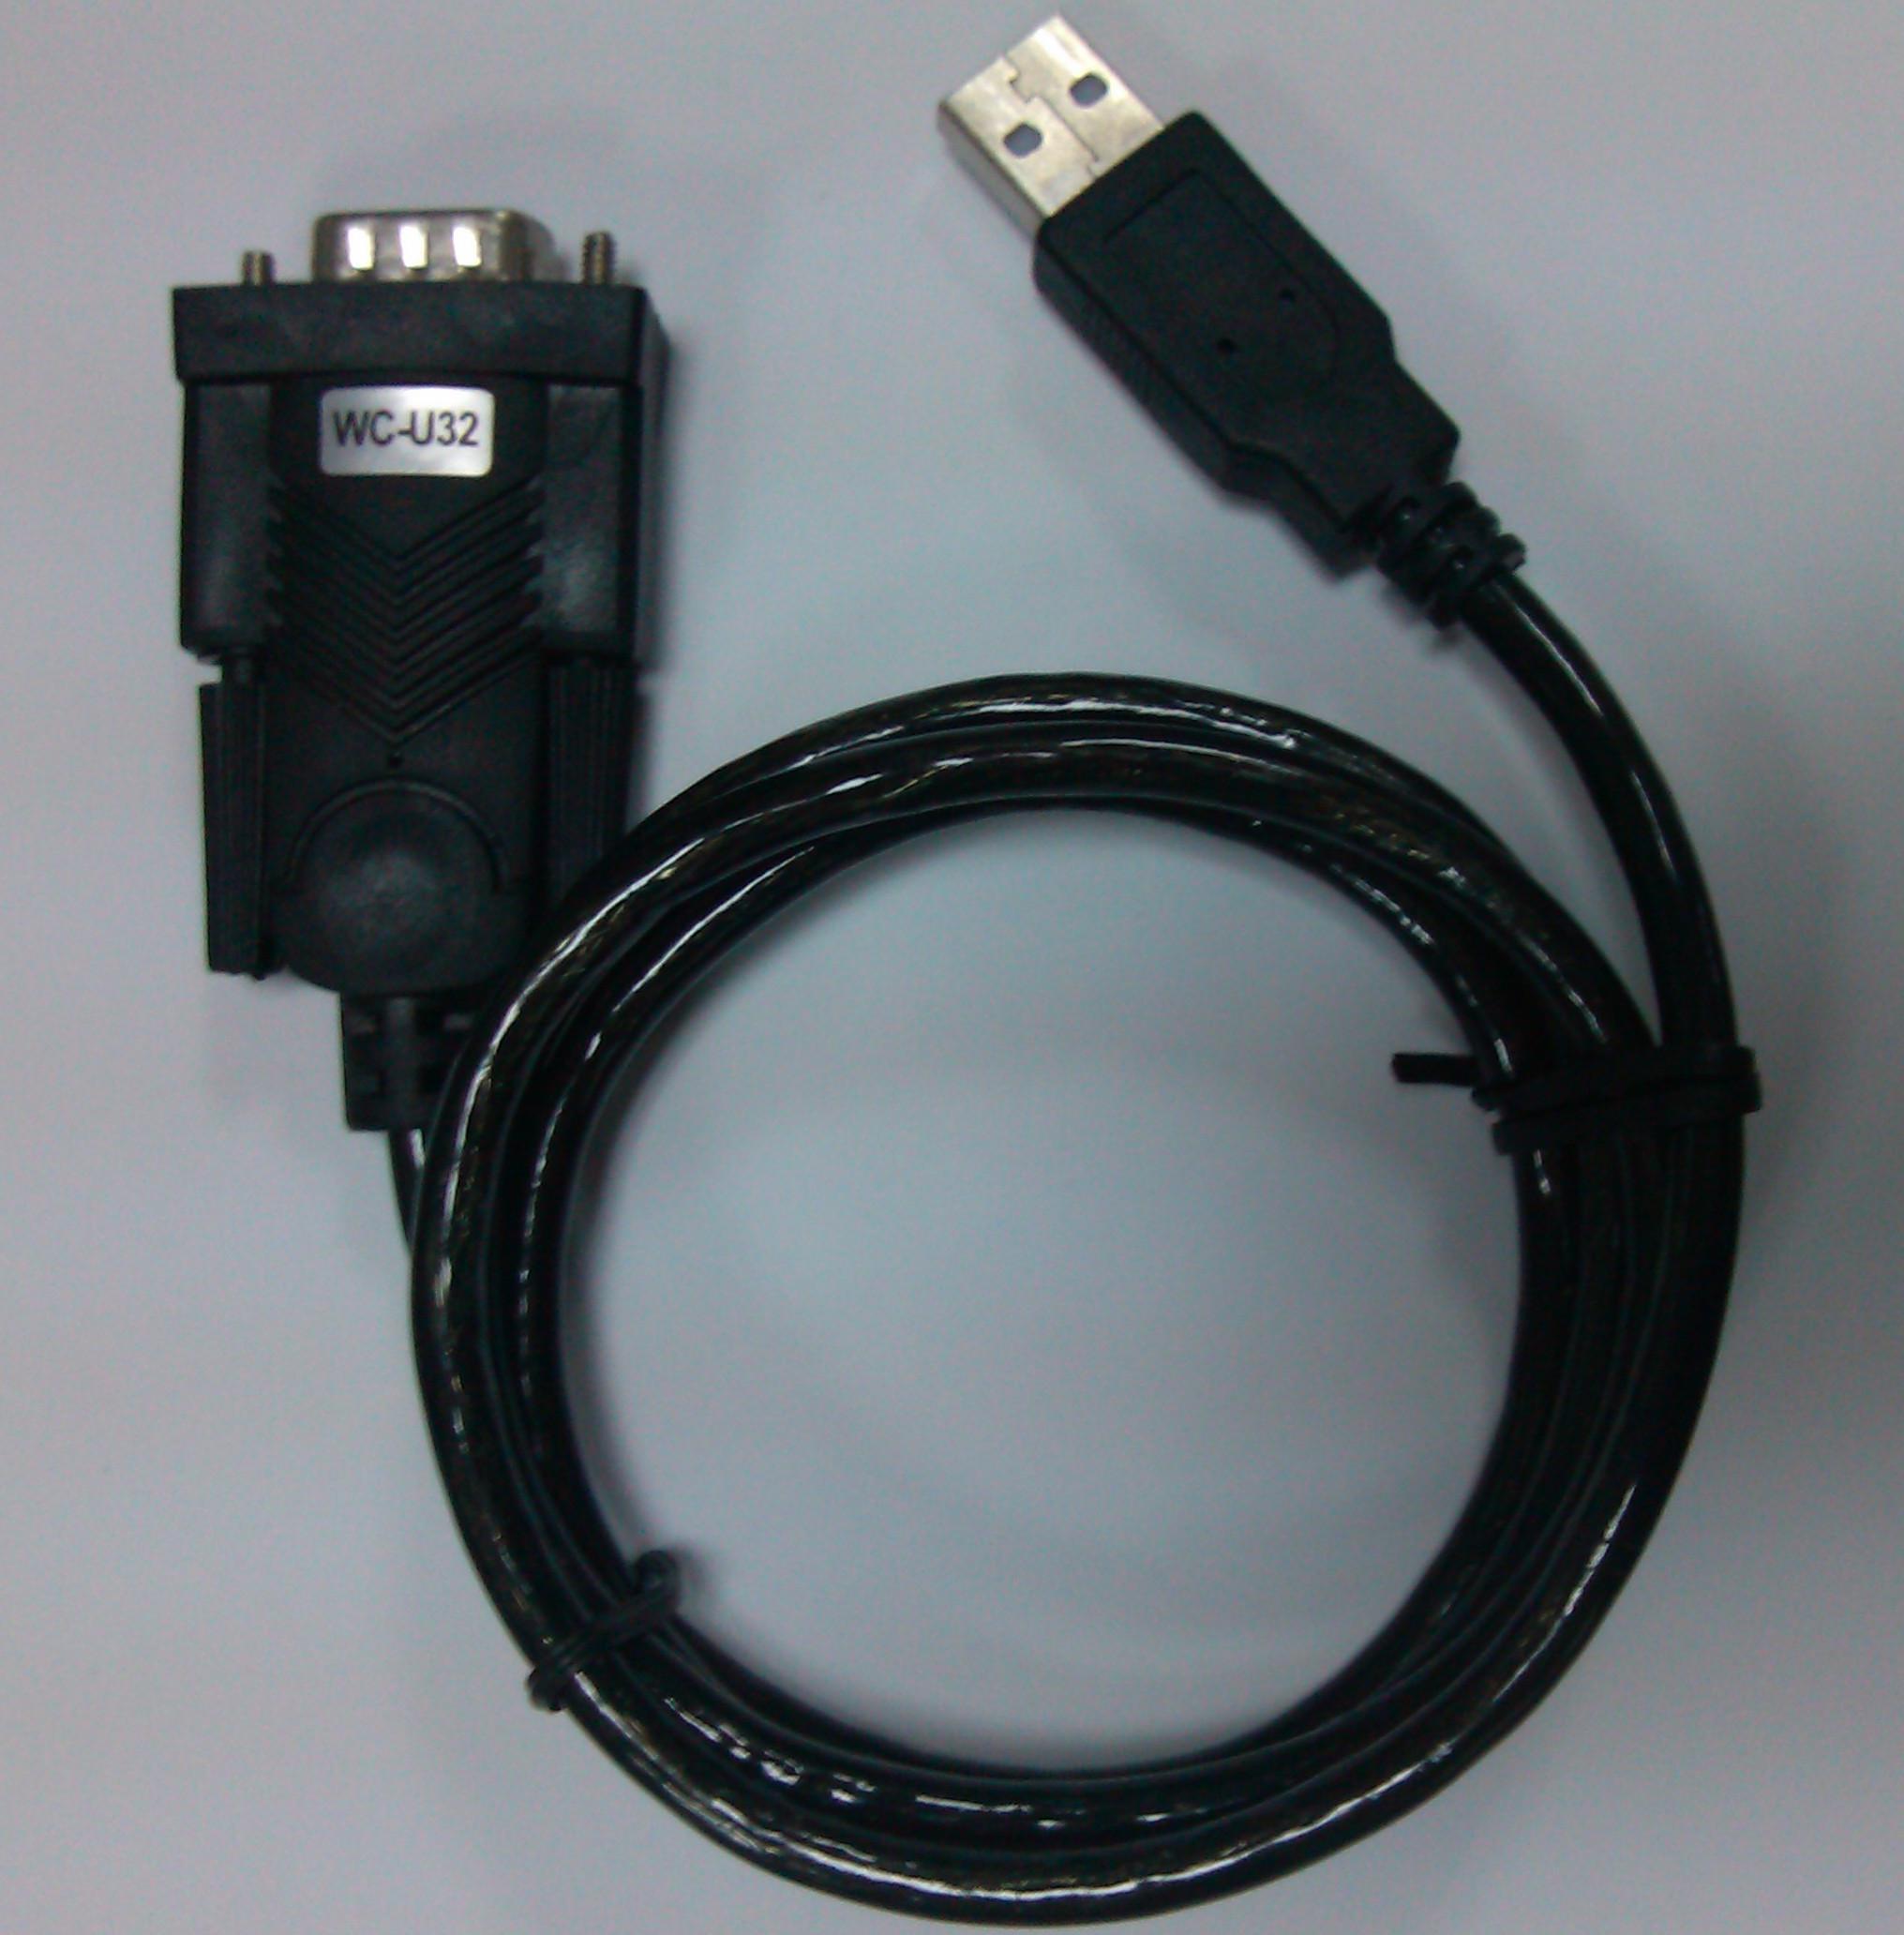 wc u32接口转换数据线 威勤 usb接口转换r高清图片